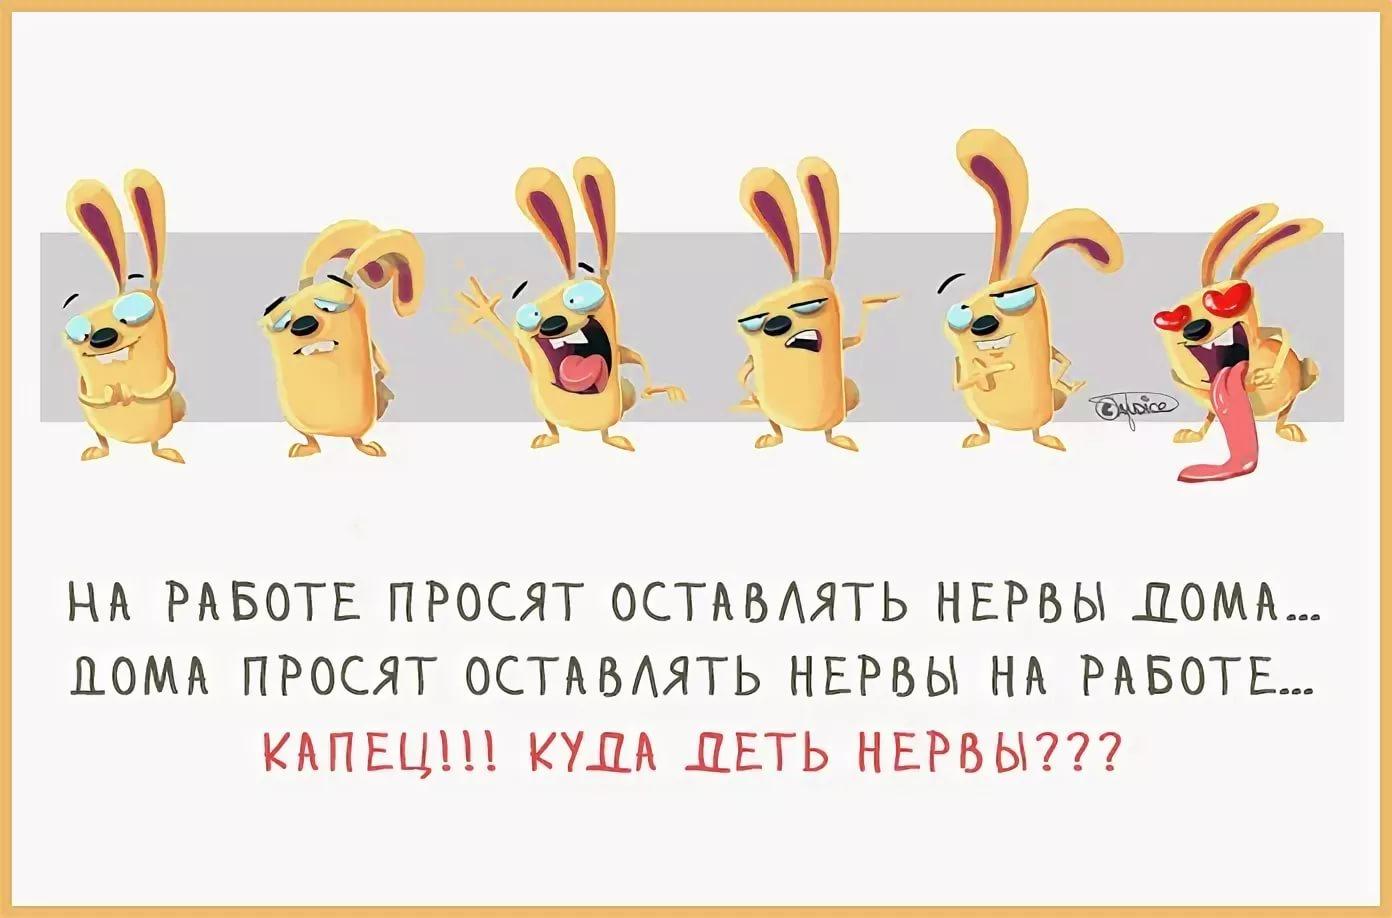 http://s00.yaplakal.com/pics/pics_original/5/5/0/12012055.jpg